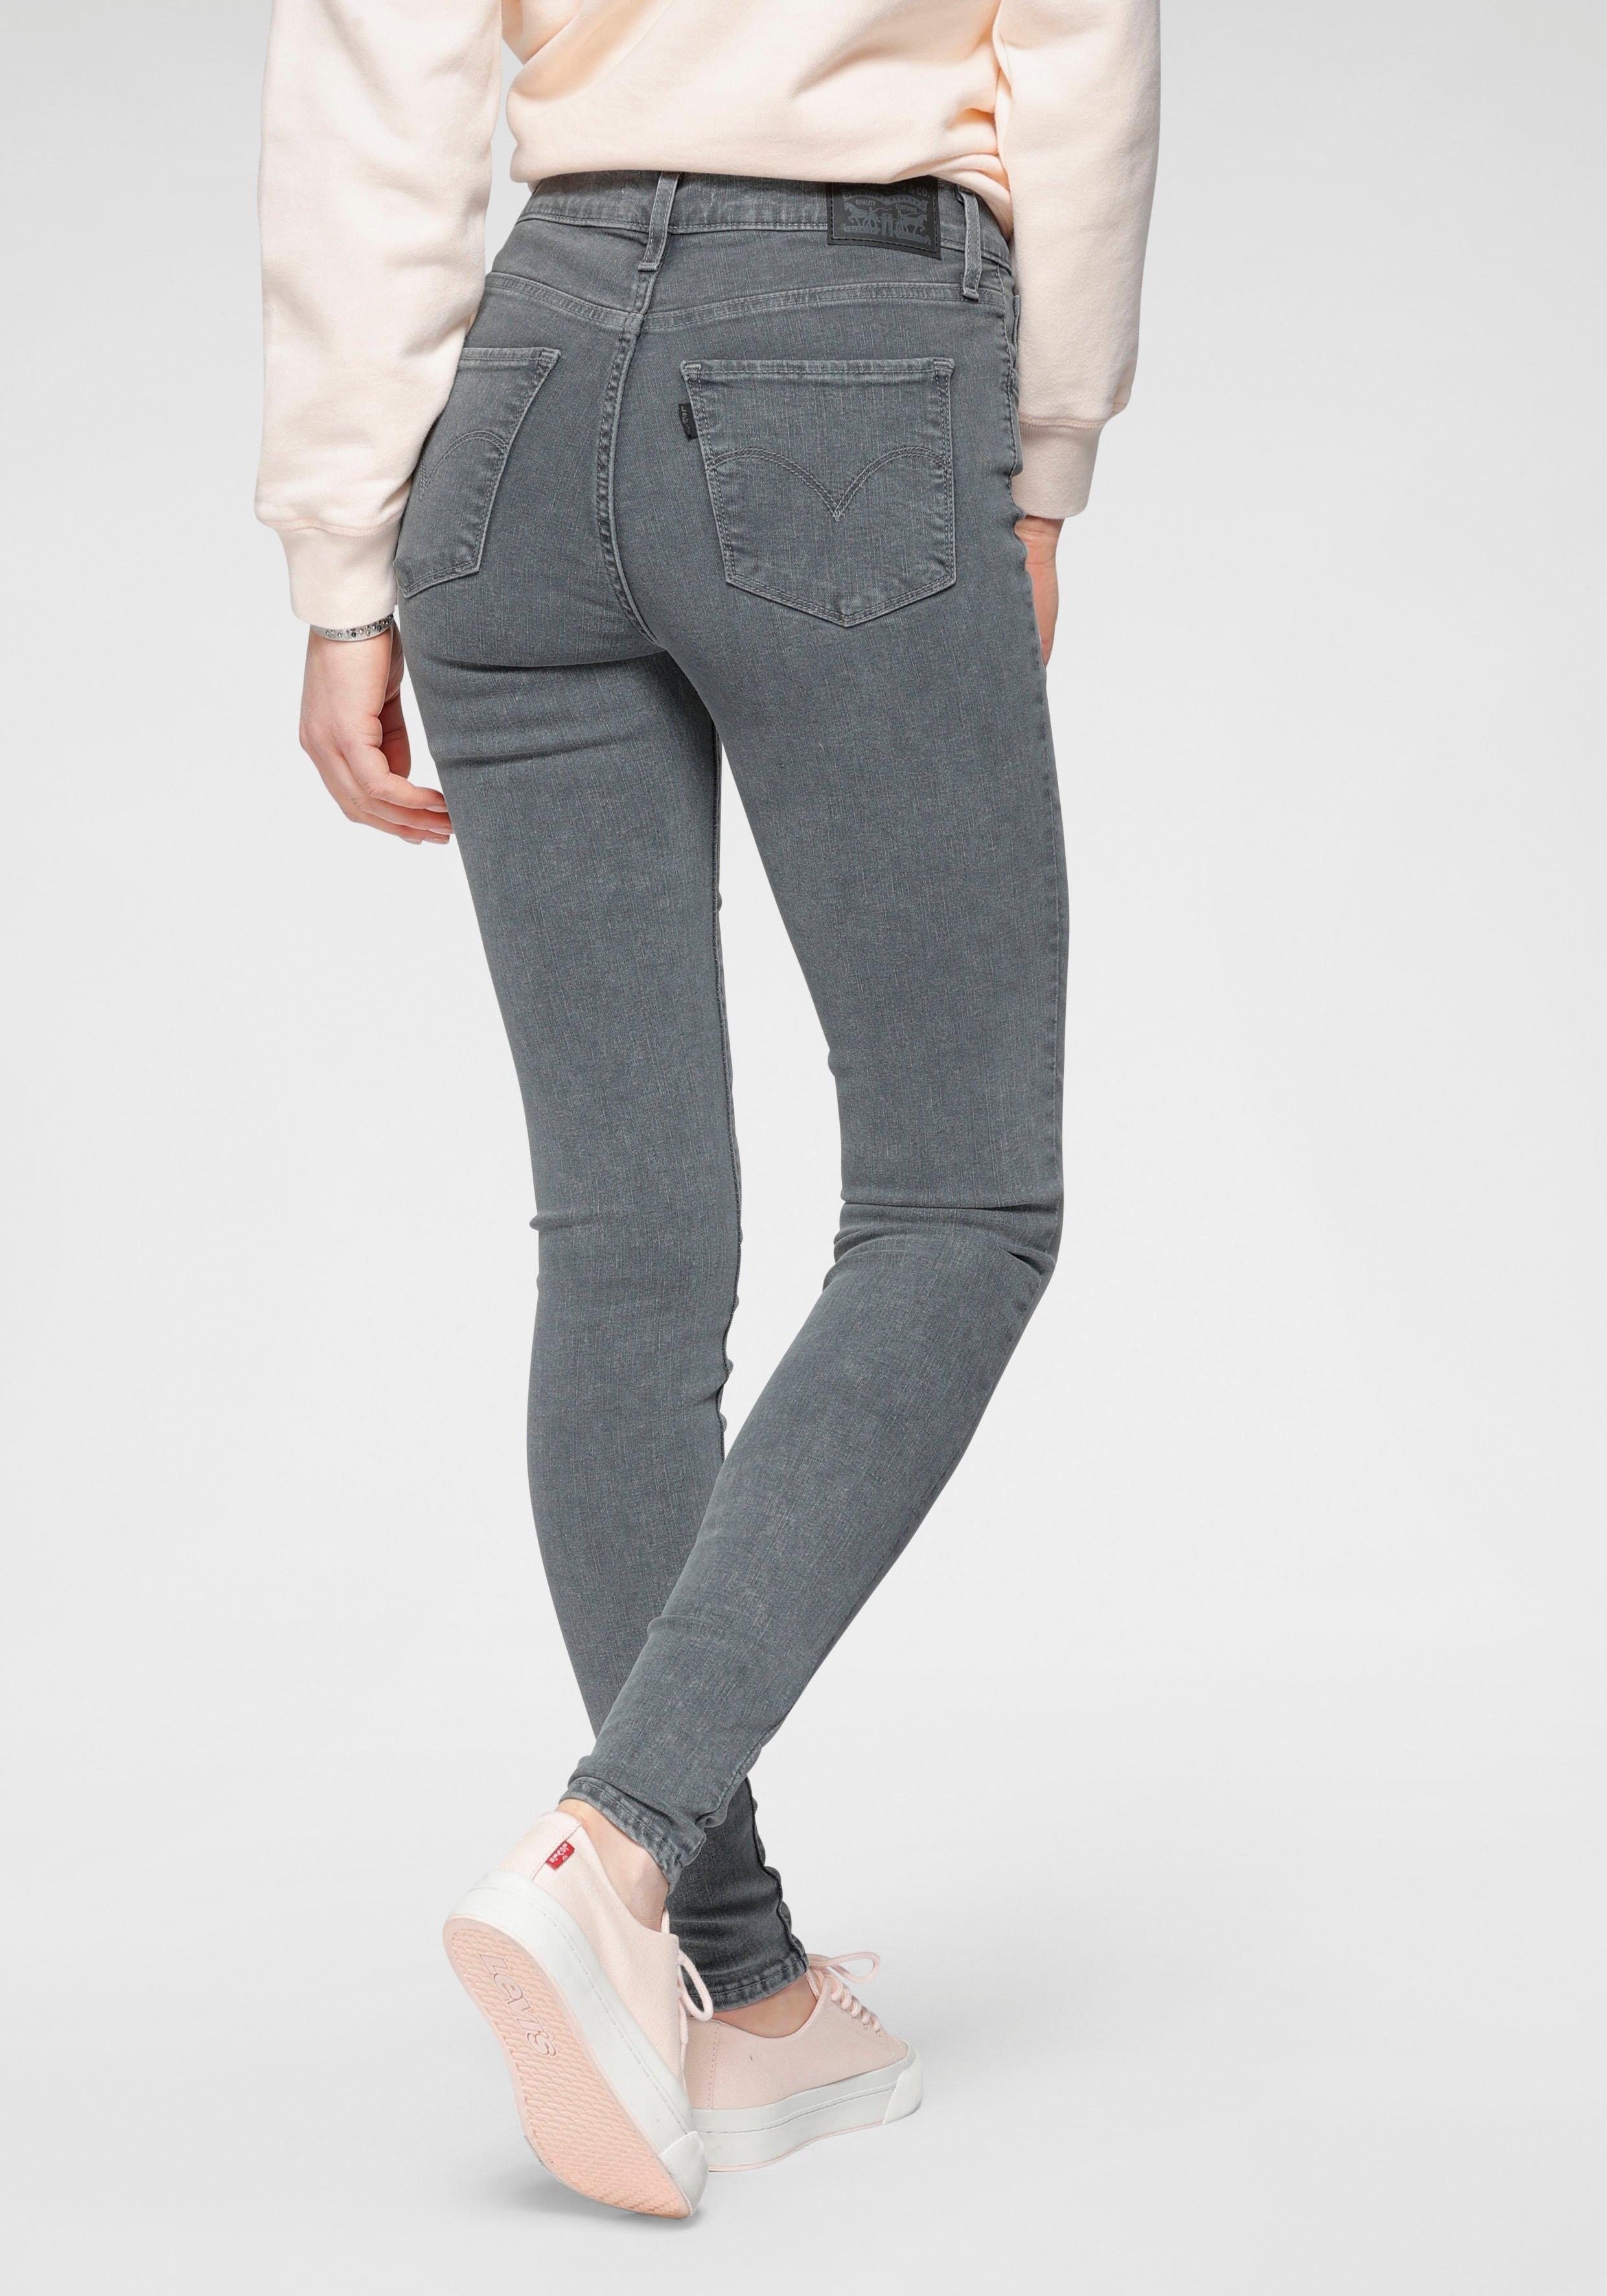 Levi's skinny fit jeans 720 High Rise Super Skinny met hoge taille bestellen: 30 dagen bedenktijd